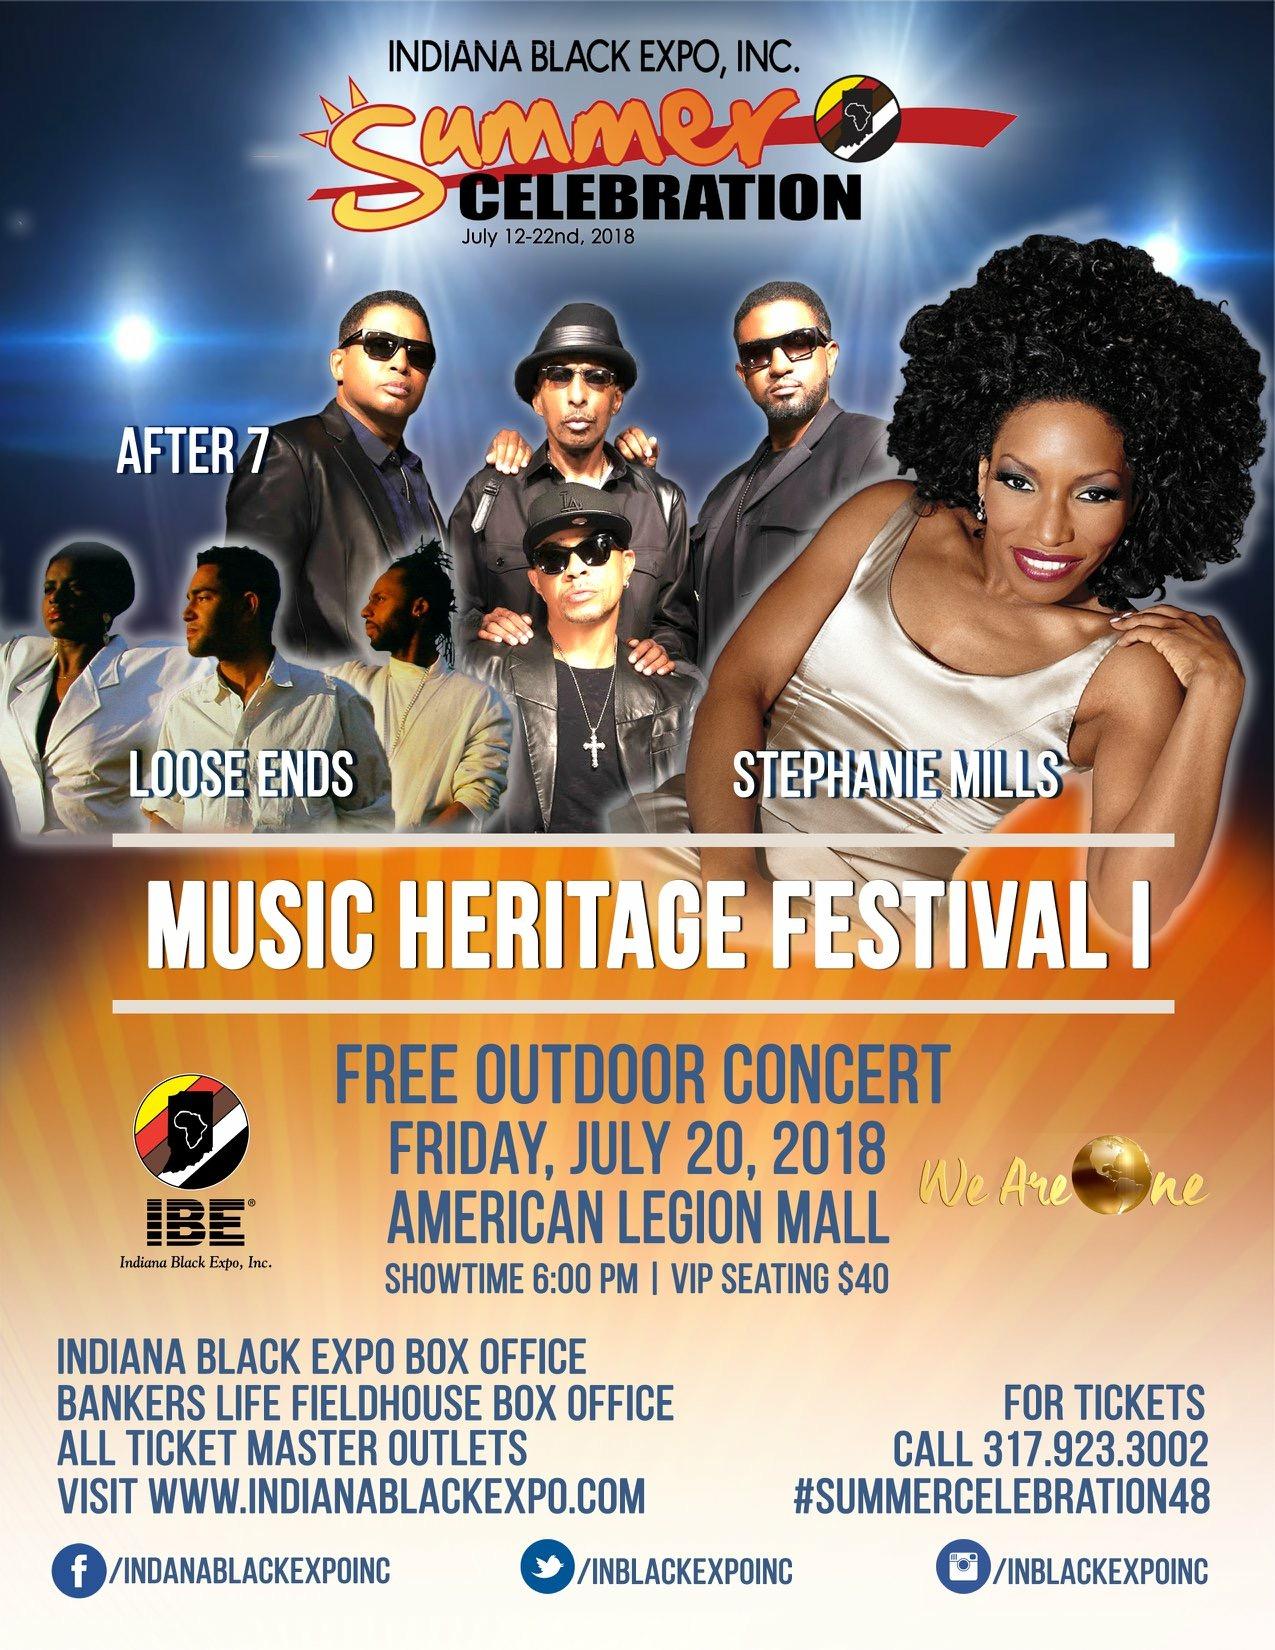 Music Heritage Festival I (Outdoor Concert) Flyer